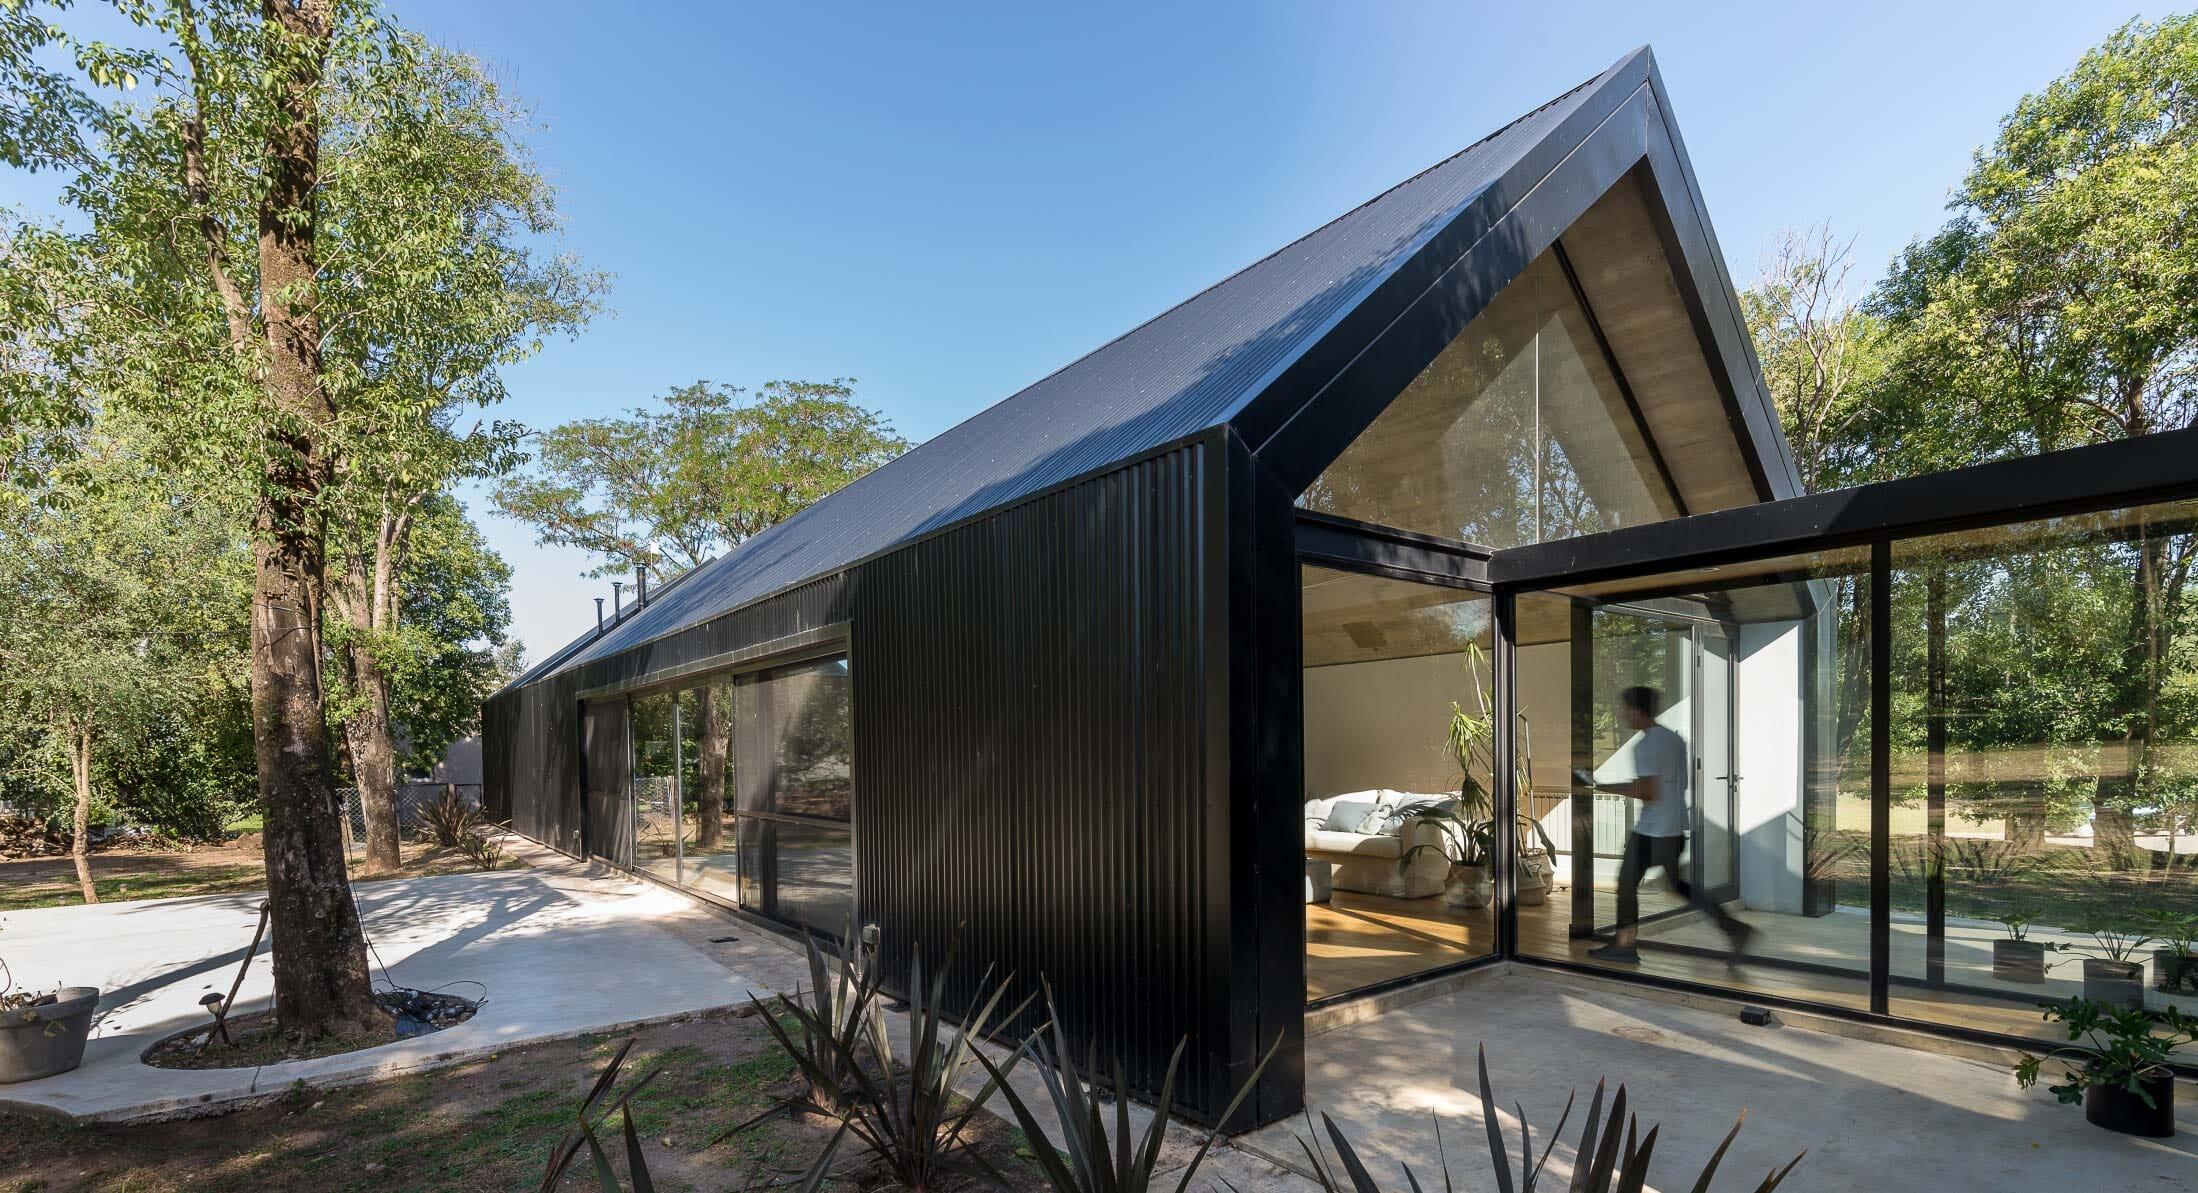 Hidden In The Trees: 'La Negrita' By Morini Arquitectos